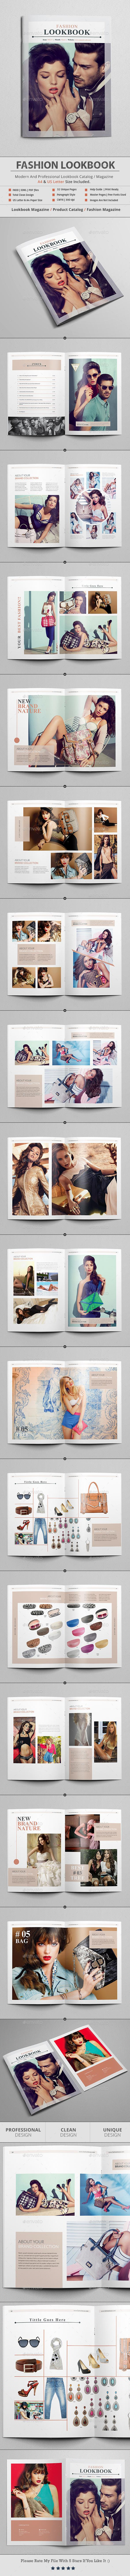 Fashion Lookbook - Magazines Print Templates